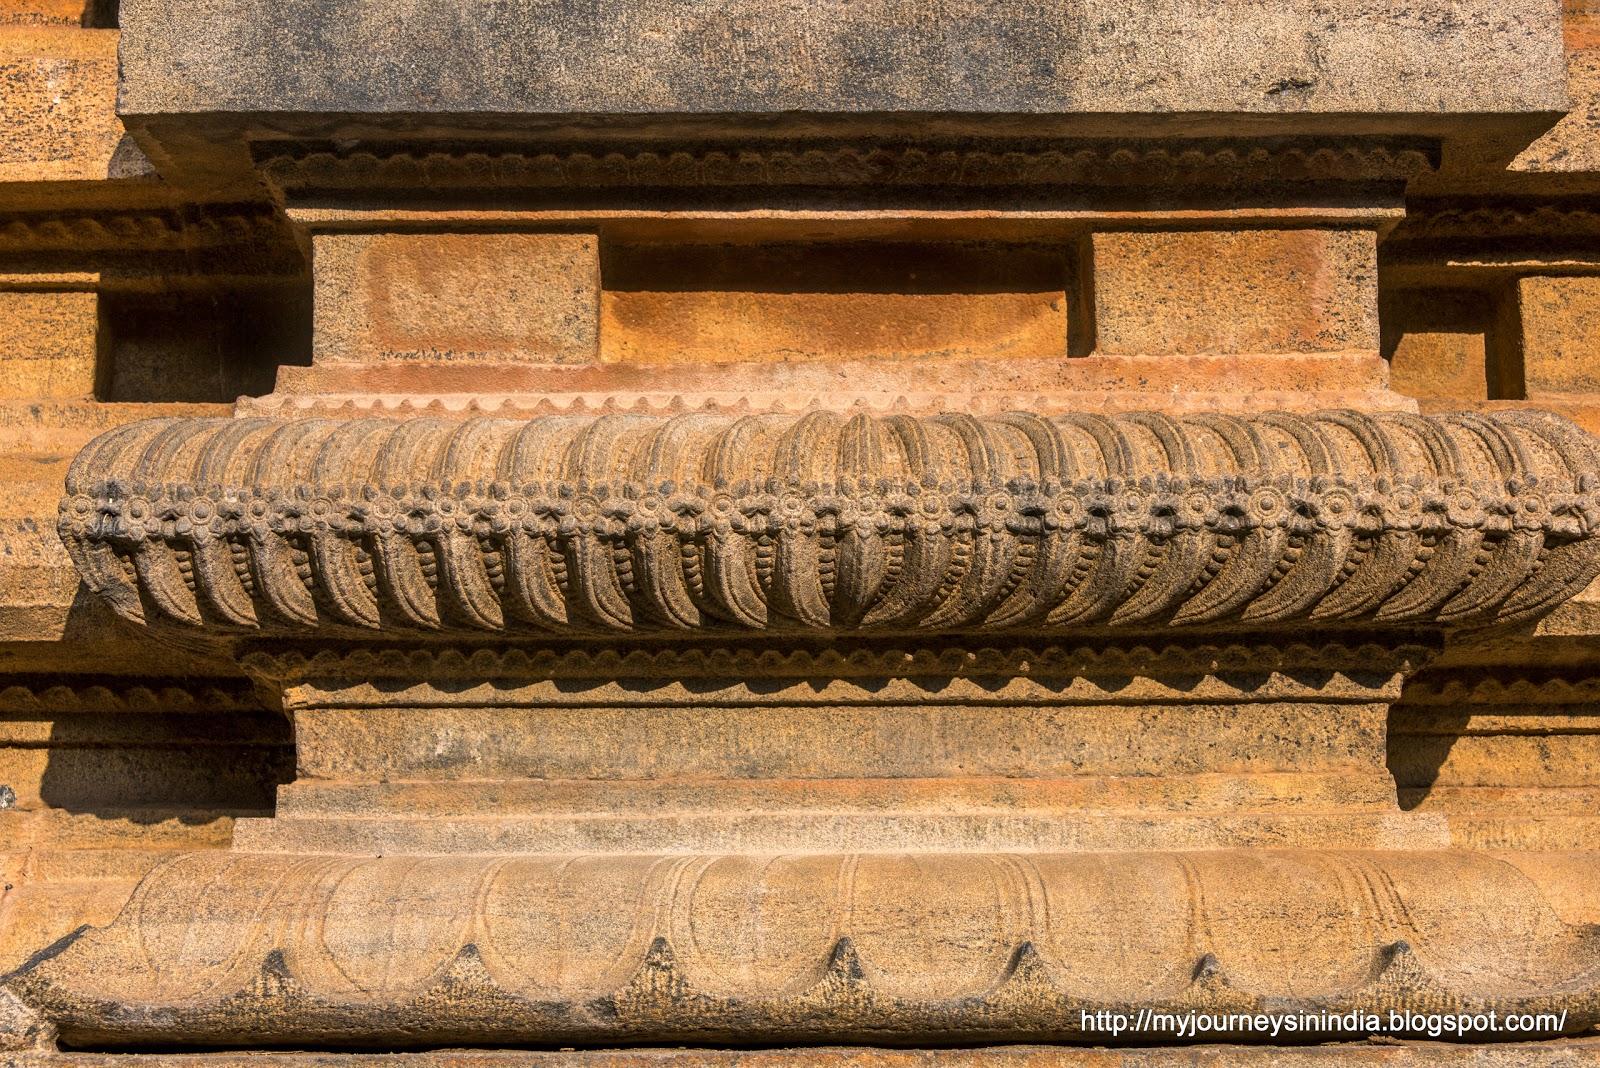 Thanjavur Brihadeeswarar Temple Intricate carvings